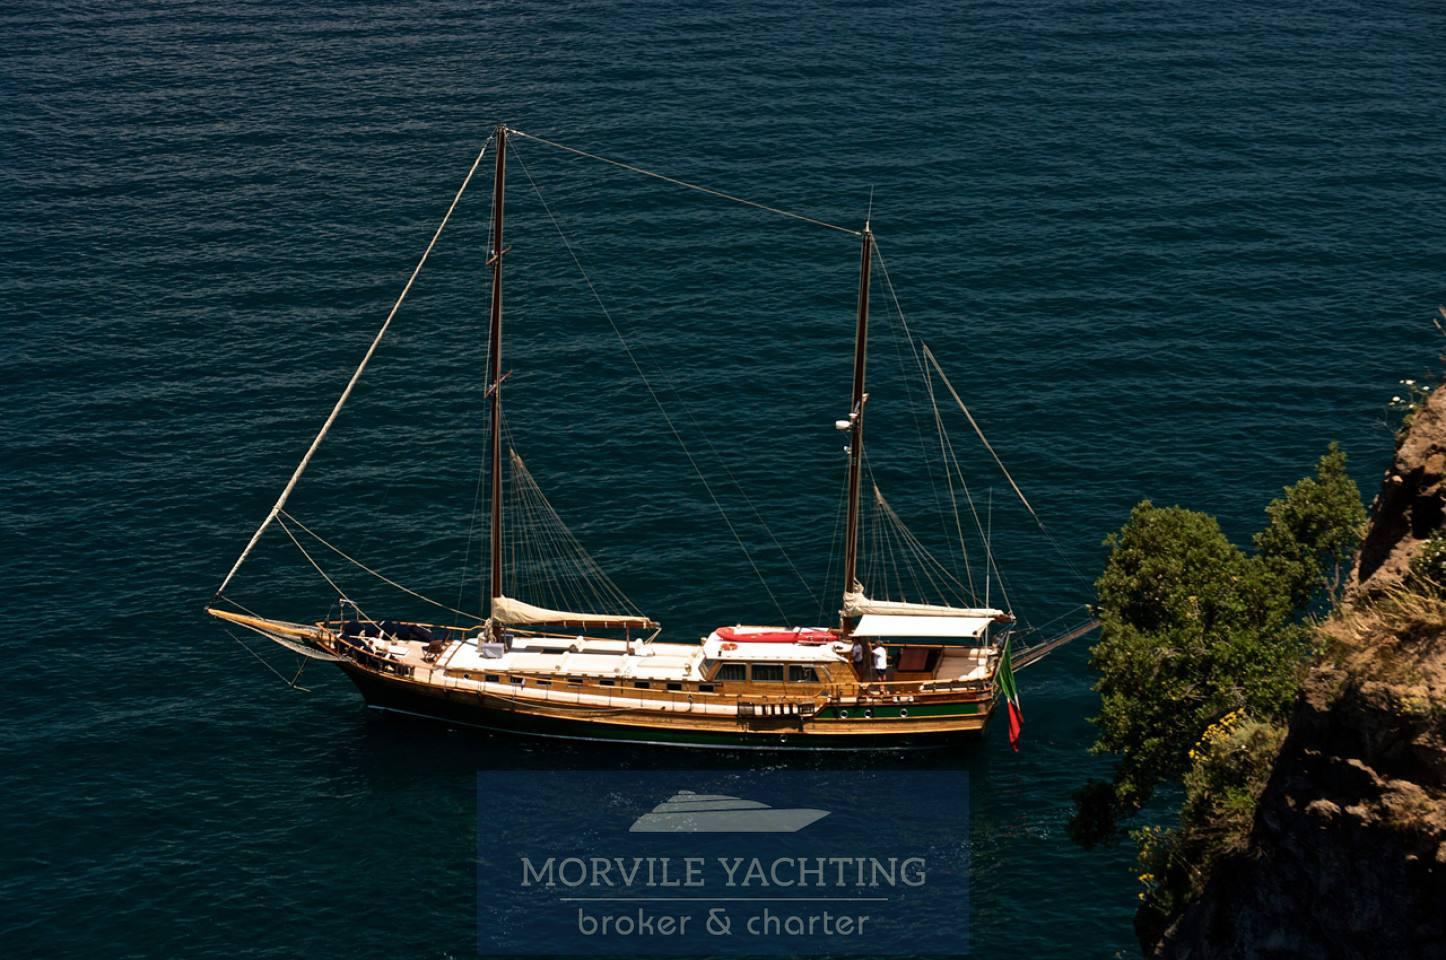 Maria Giovanna Caicco turco Barca a vela charter